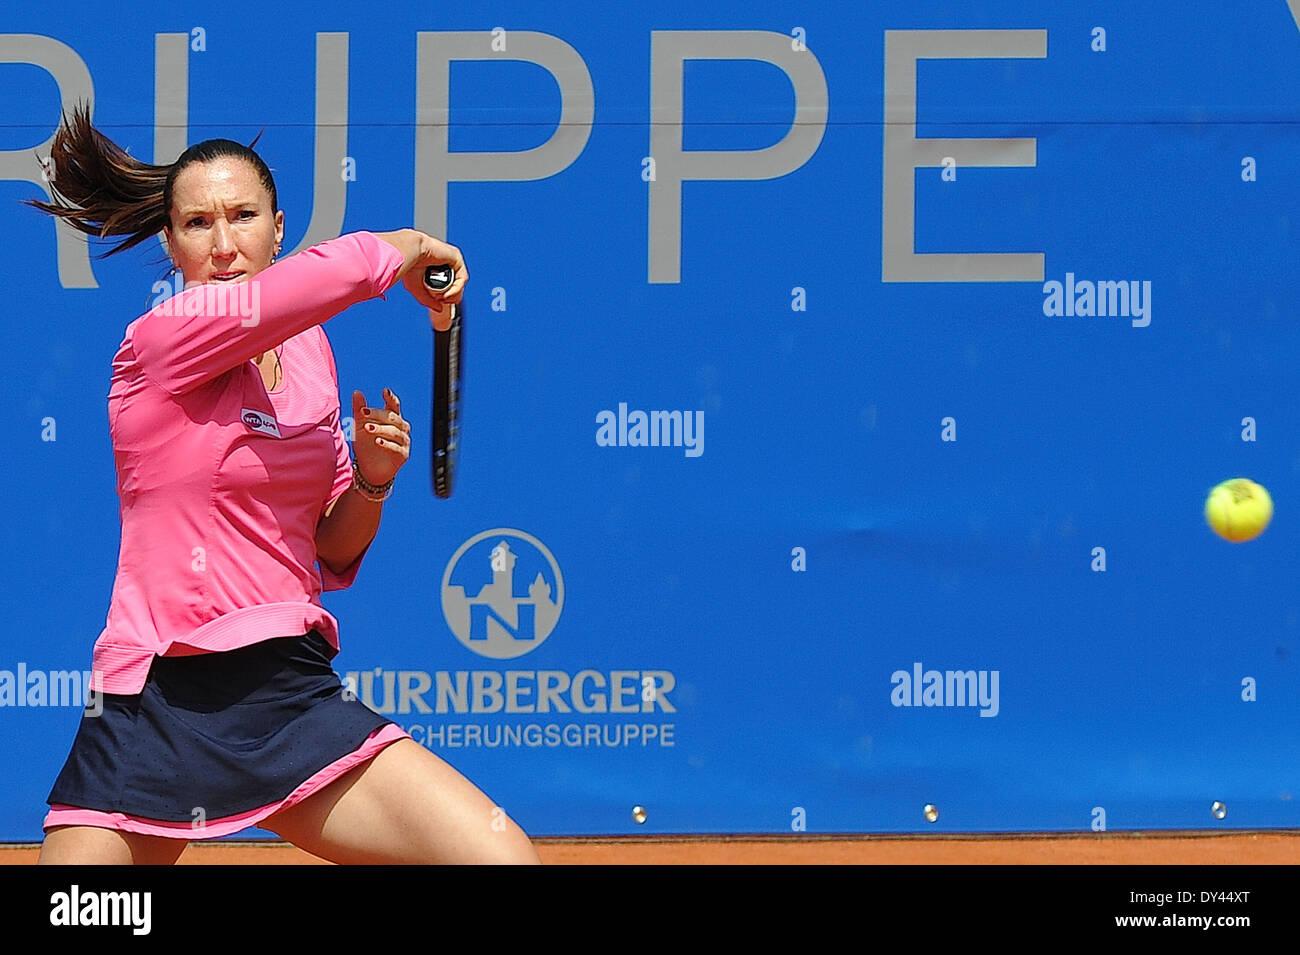 Jelena Janković, WTA ,Tennis-Profi for editorial use only nur für redaktionelle Zwecke, - Stock Image